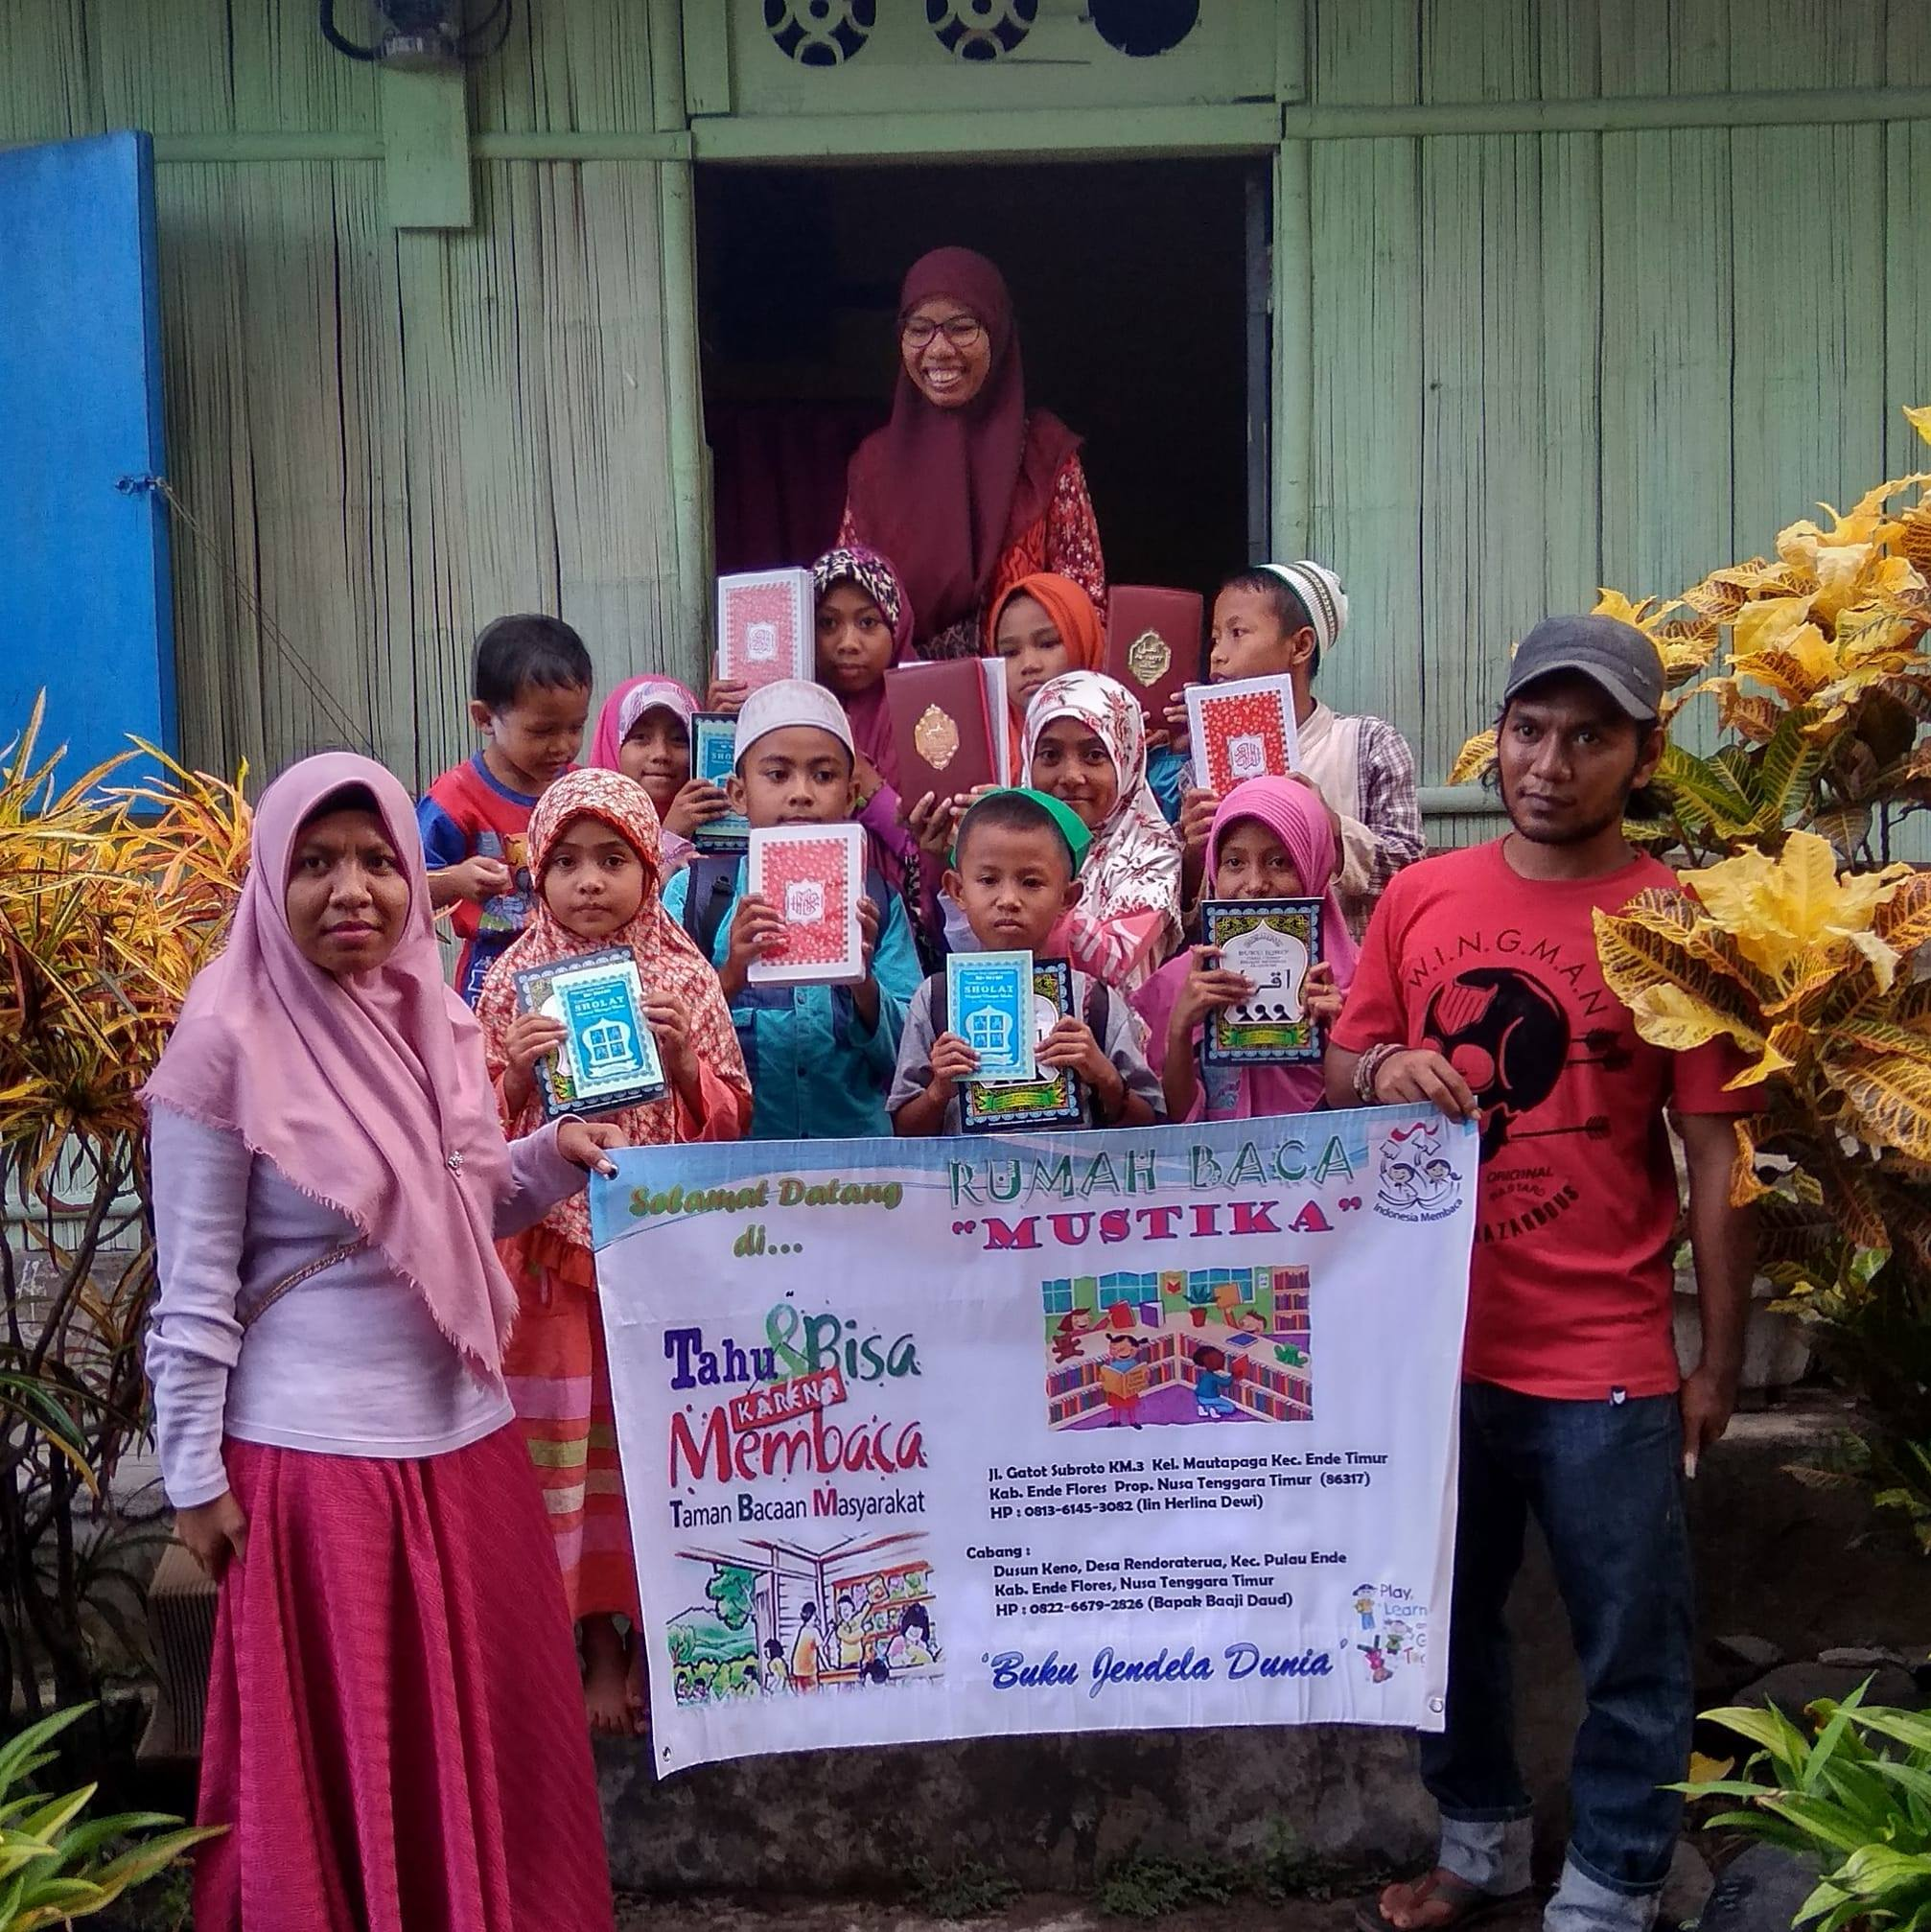 Rumah Baca Mustika